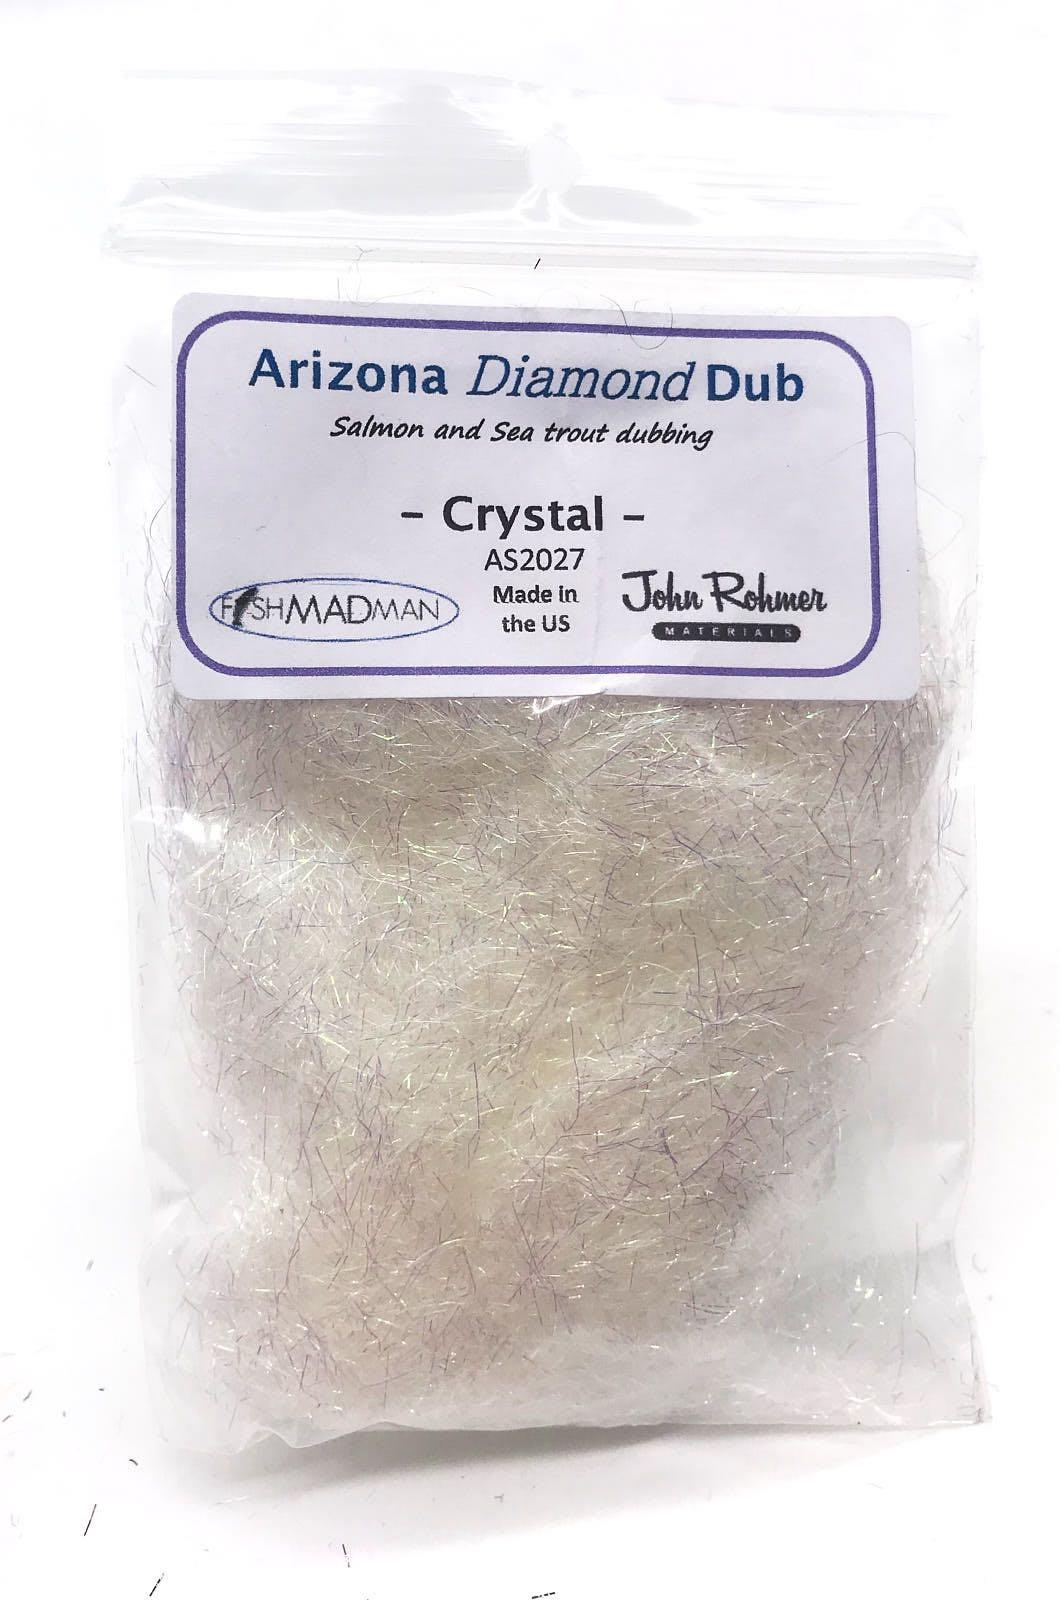 Arizona Diamond Dub Crystal